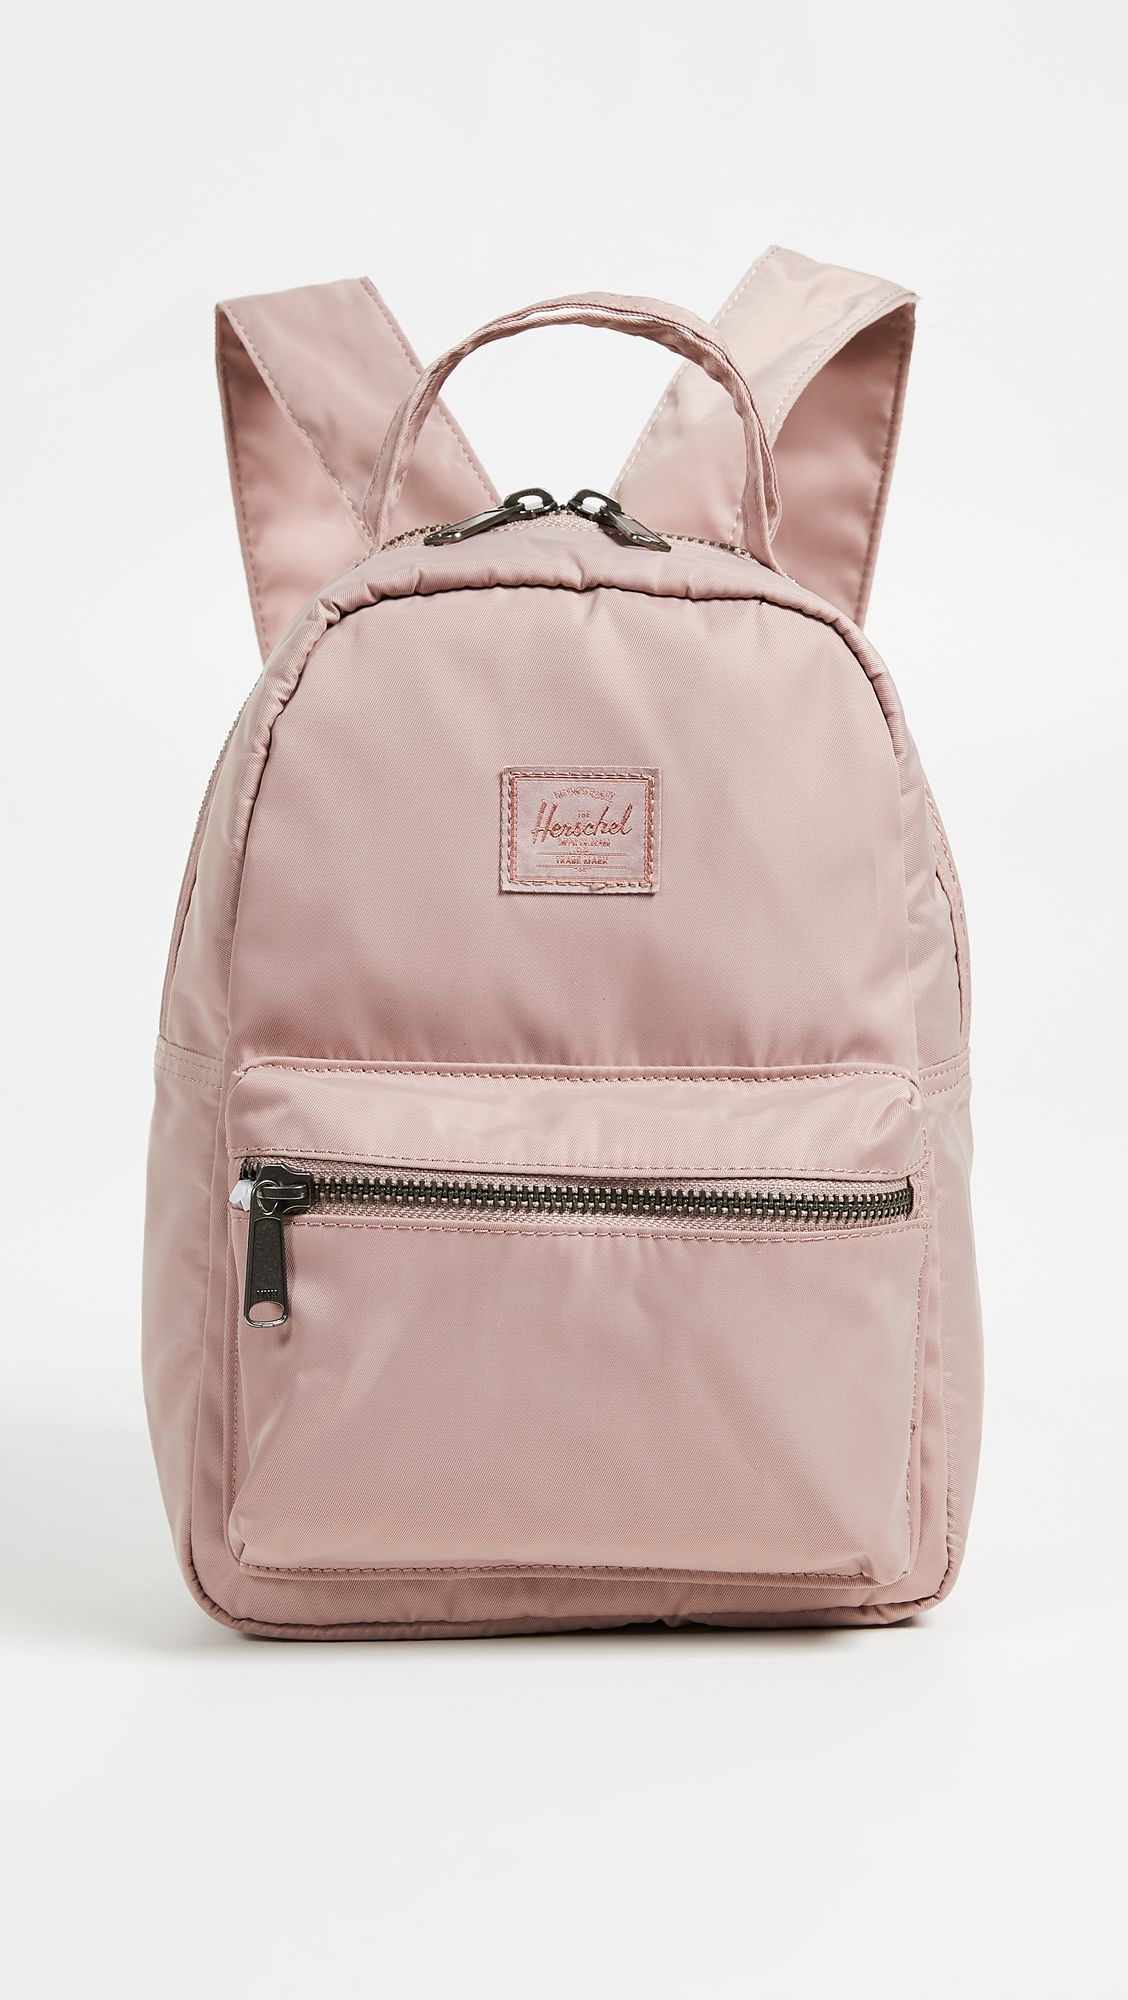 a6fe7c2c7f6d Herschel Supply Co. Flight Satin Nova Mini Backpack